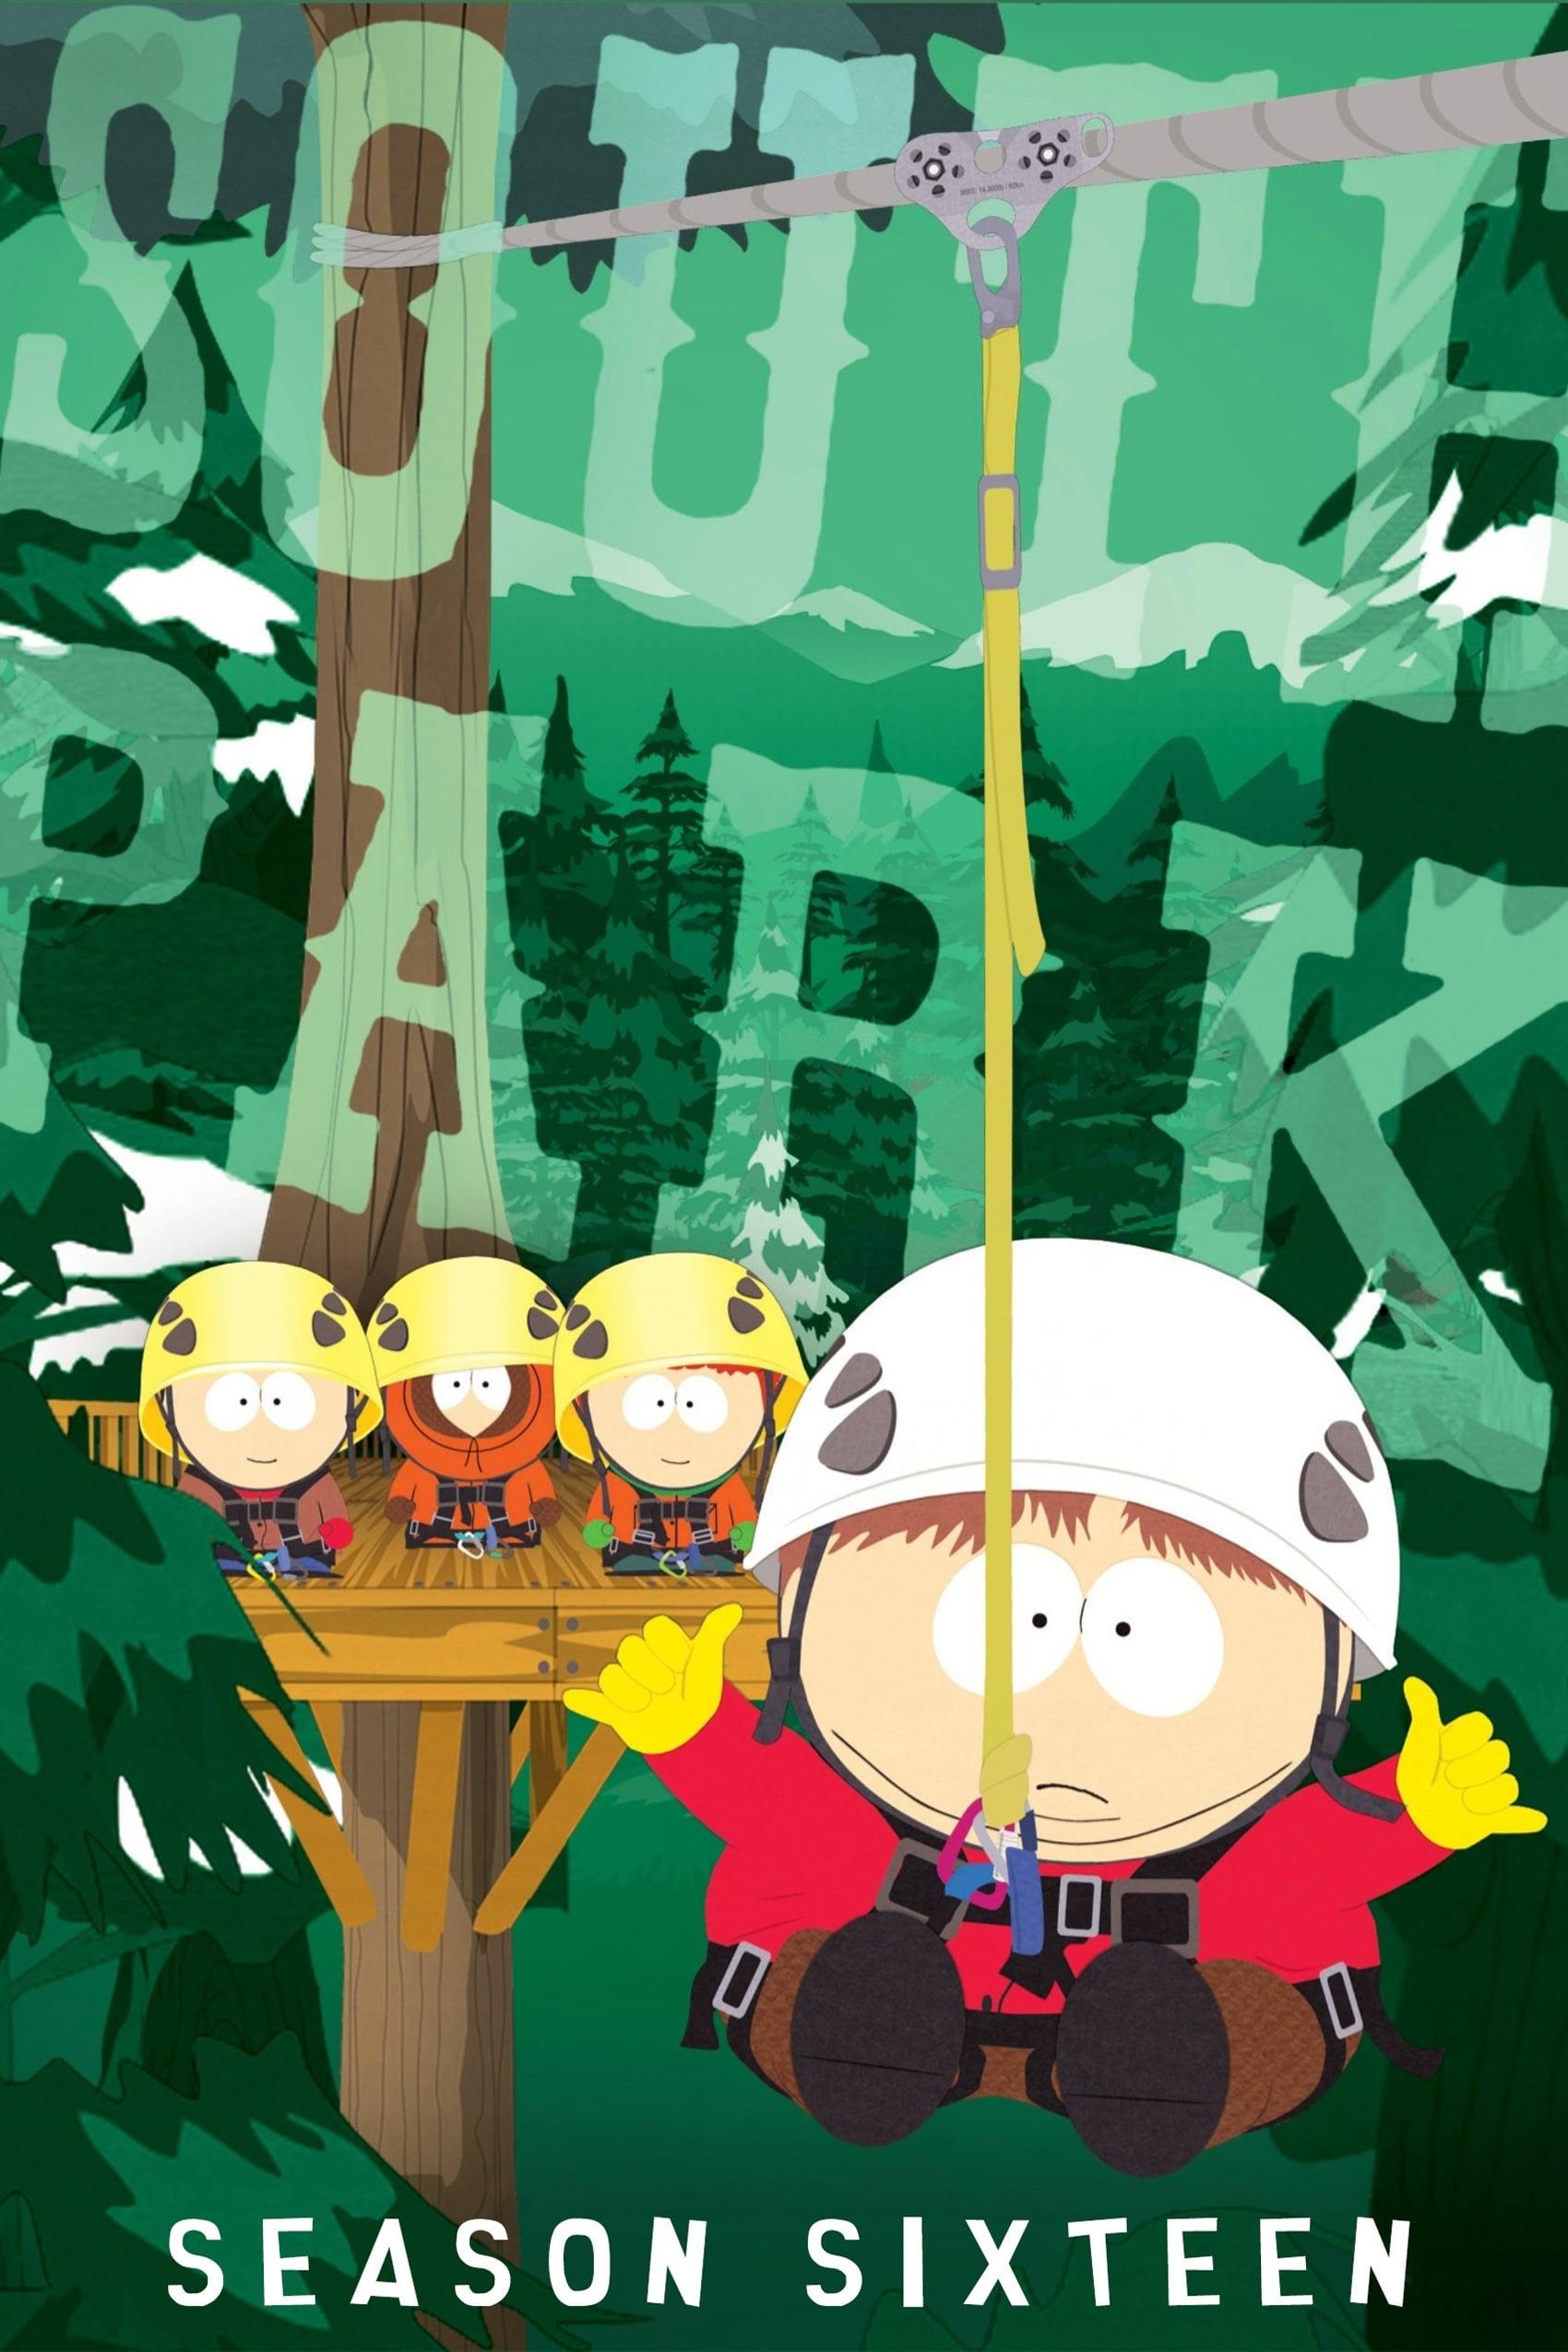 South Park Season 16